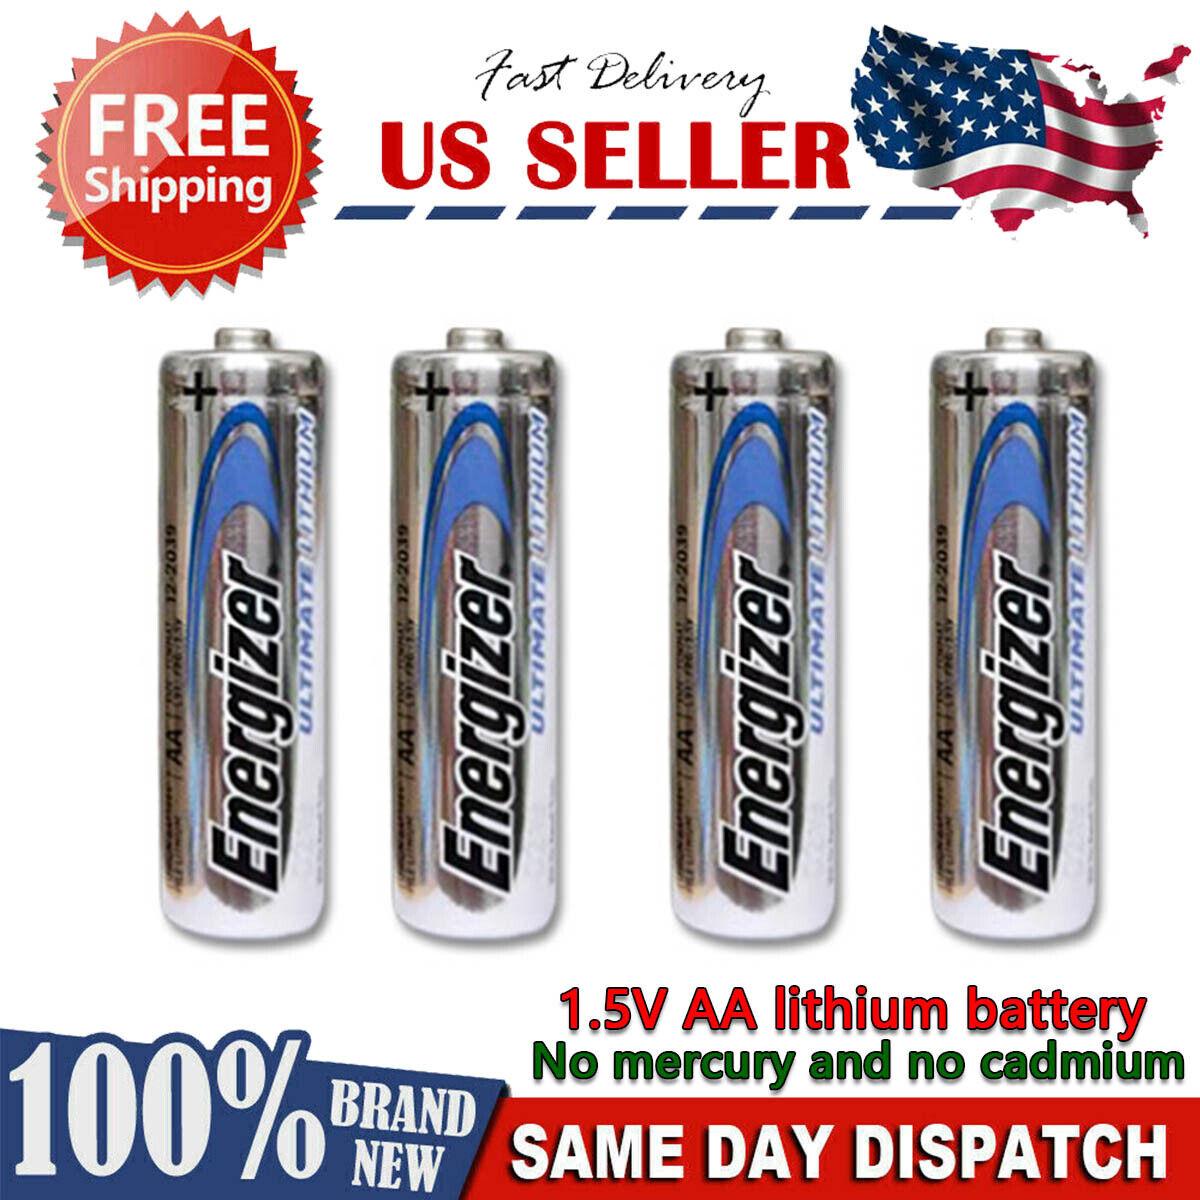 AA Battery 1.5V 3000mah 3.0Ah For Alarm clock, electric toys Universal batteries